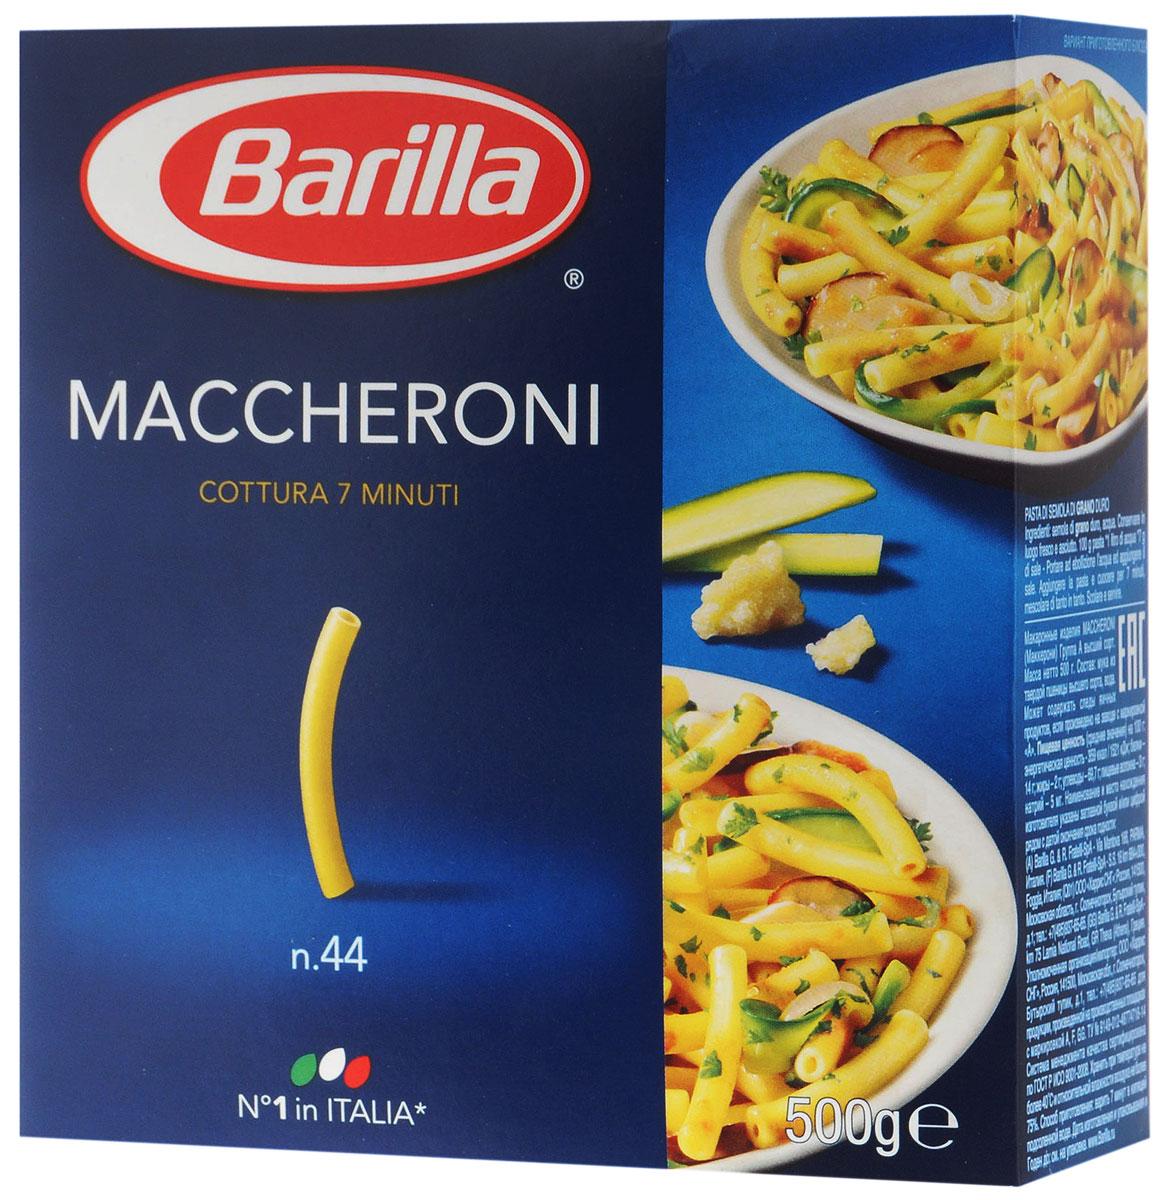 Barilla Maccheroni паста маккерони, 500 г